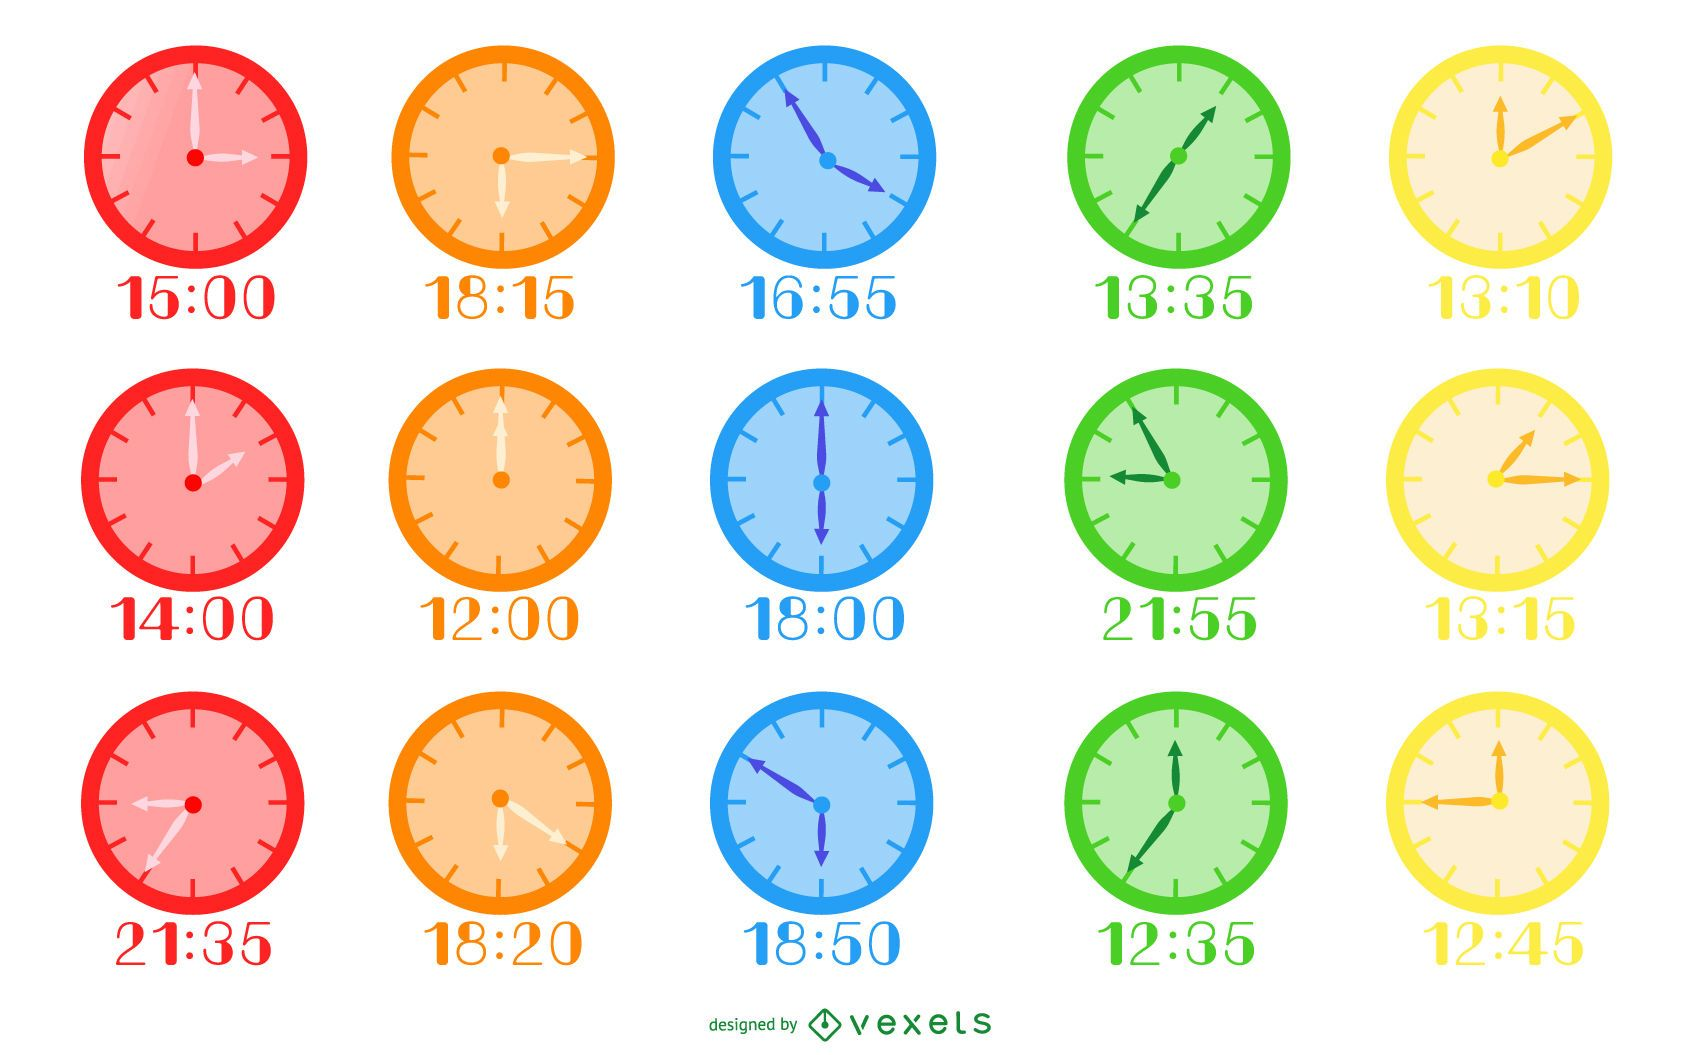 Colorful Flat Design Clock Pack